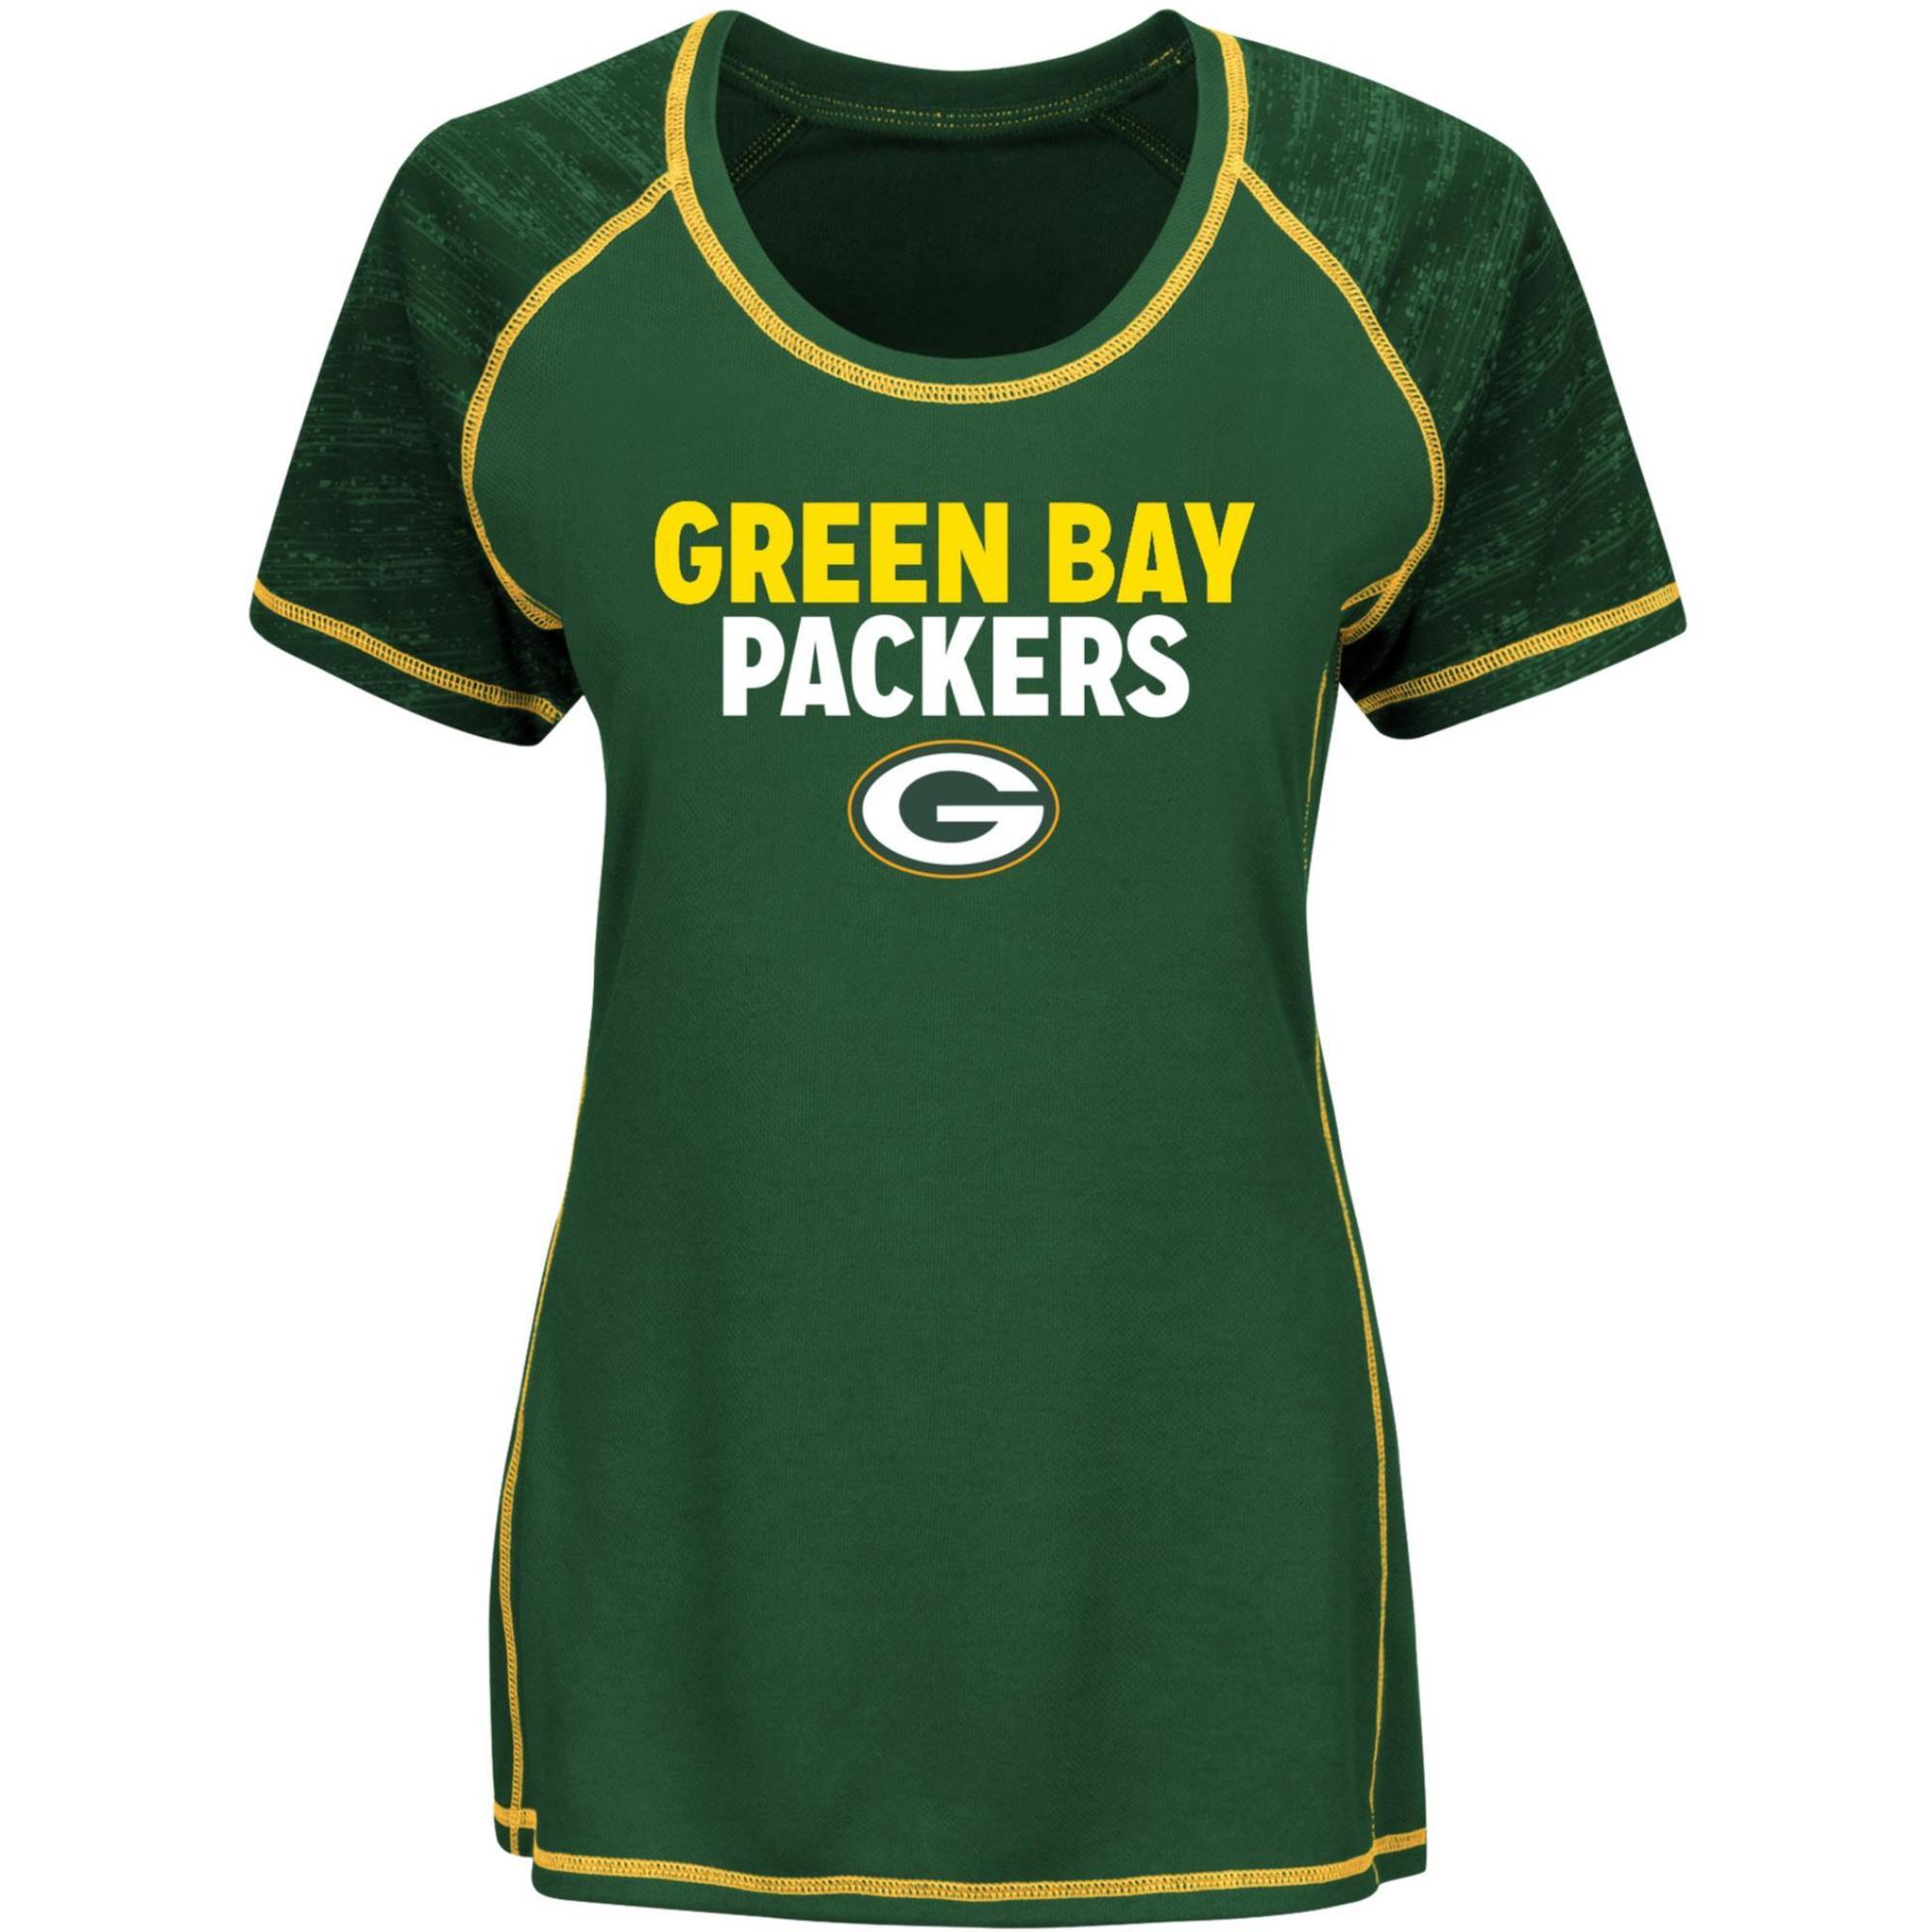 Nfl Women' Performance T-shirt - Green Bay Packers